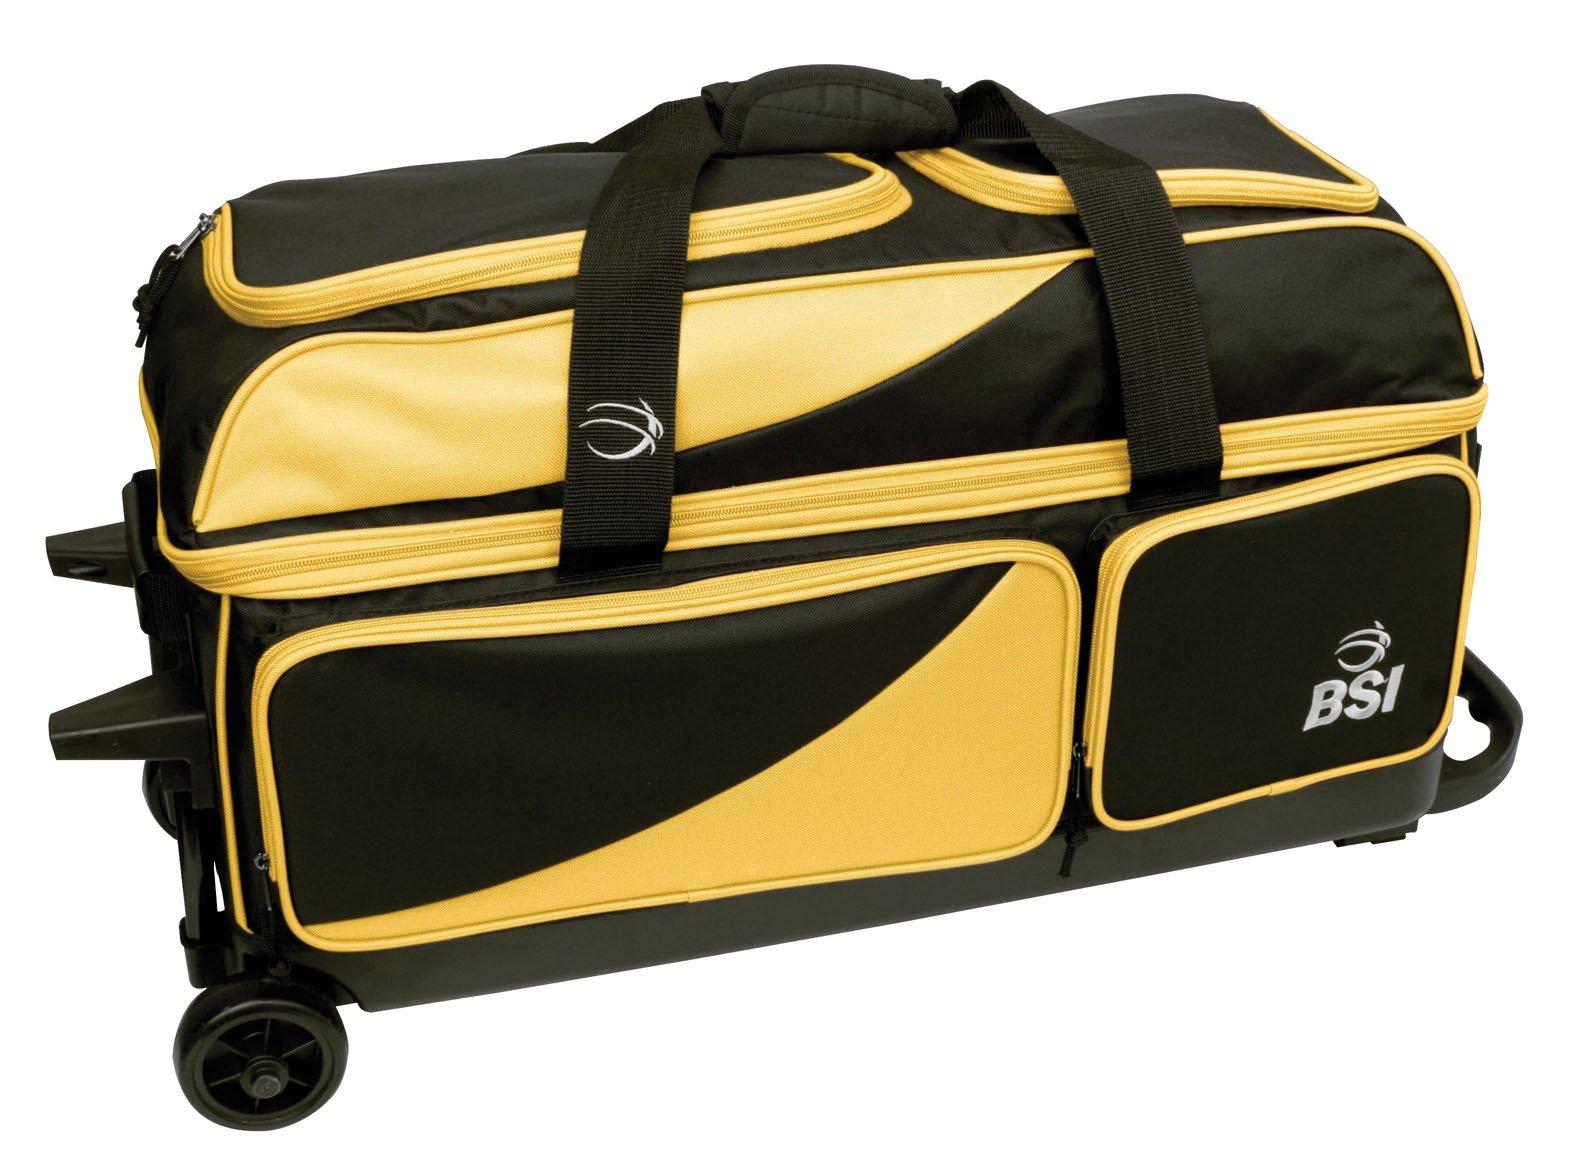 BSI Triple Ball Roller Bag, Black/Yellow